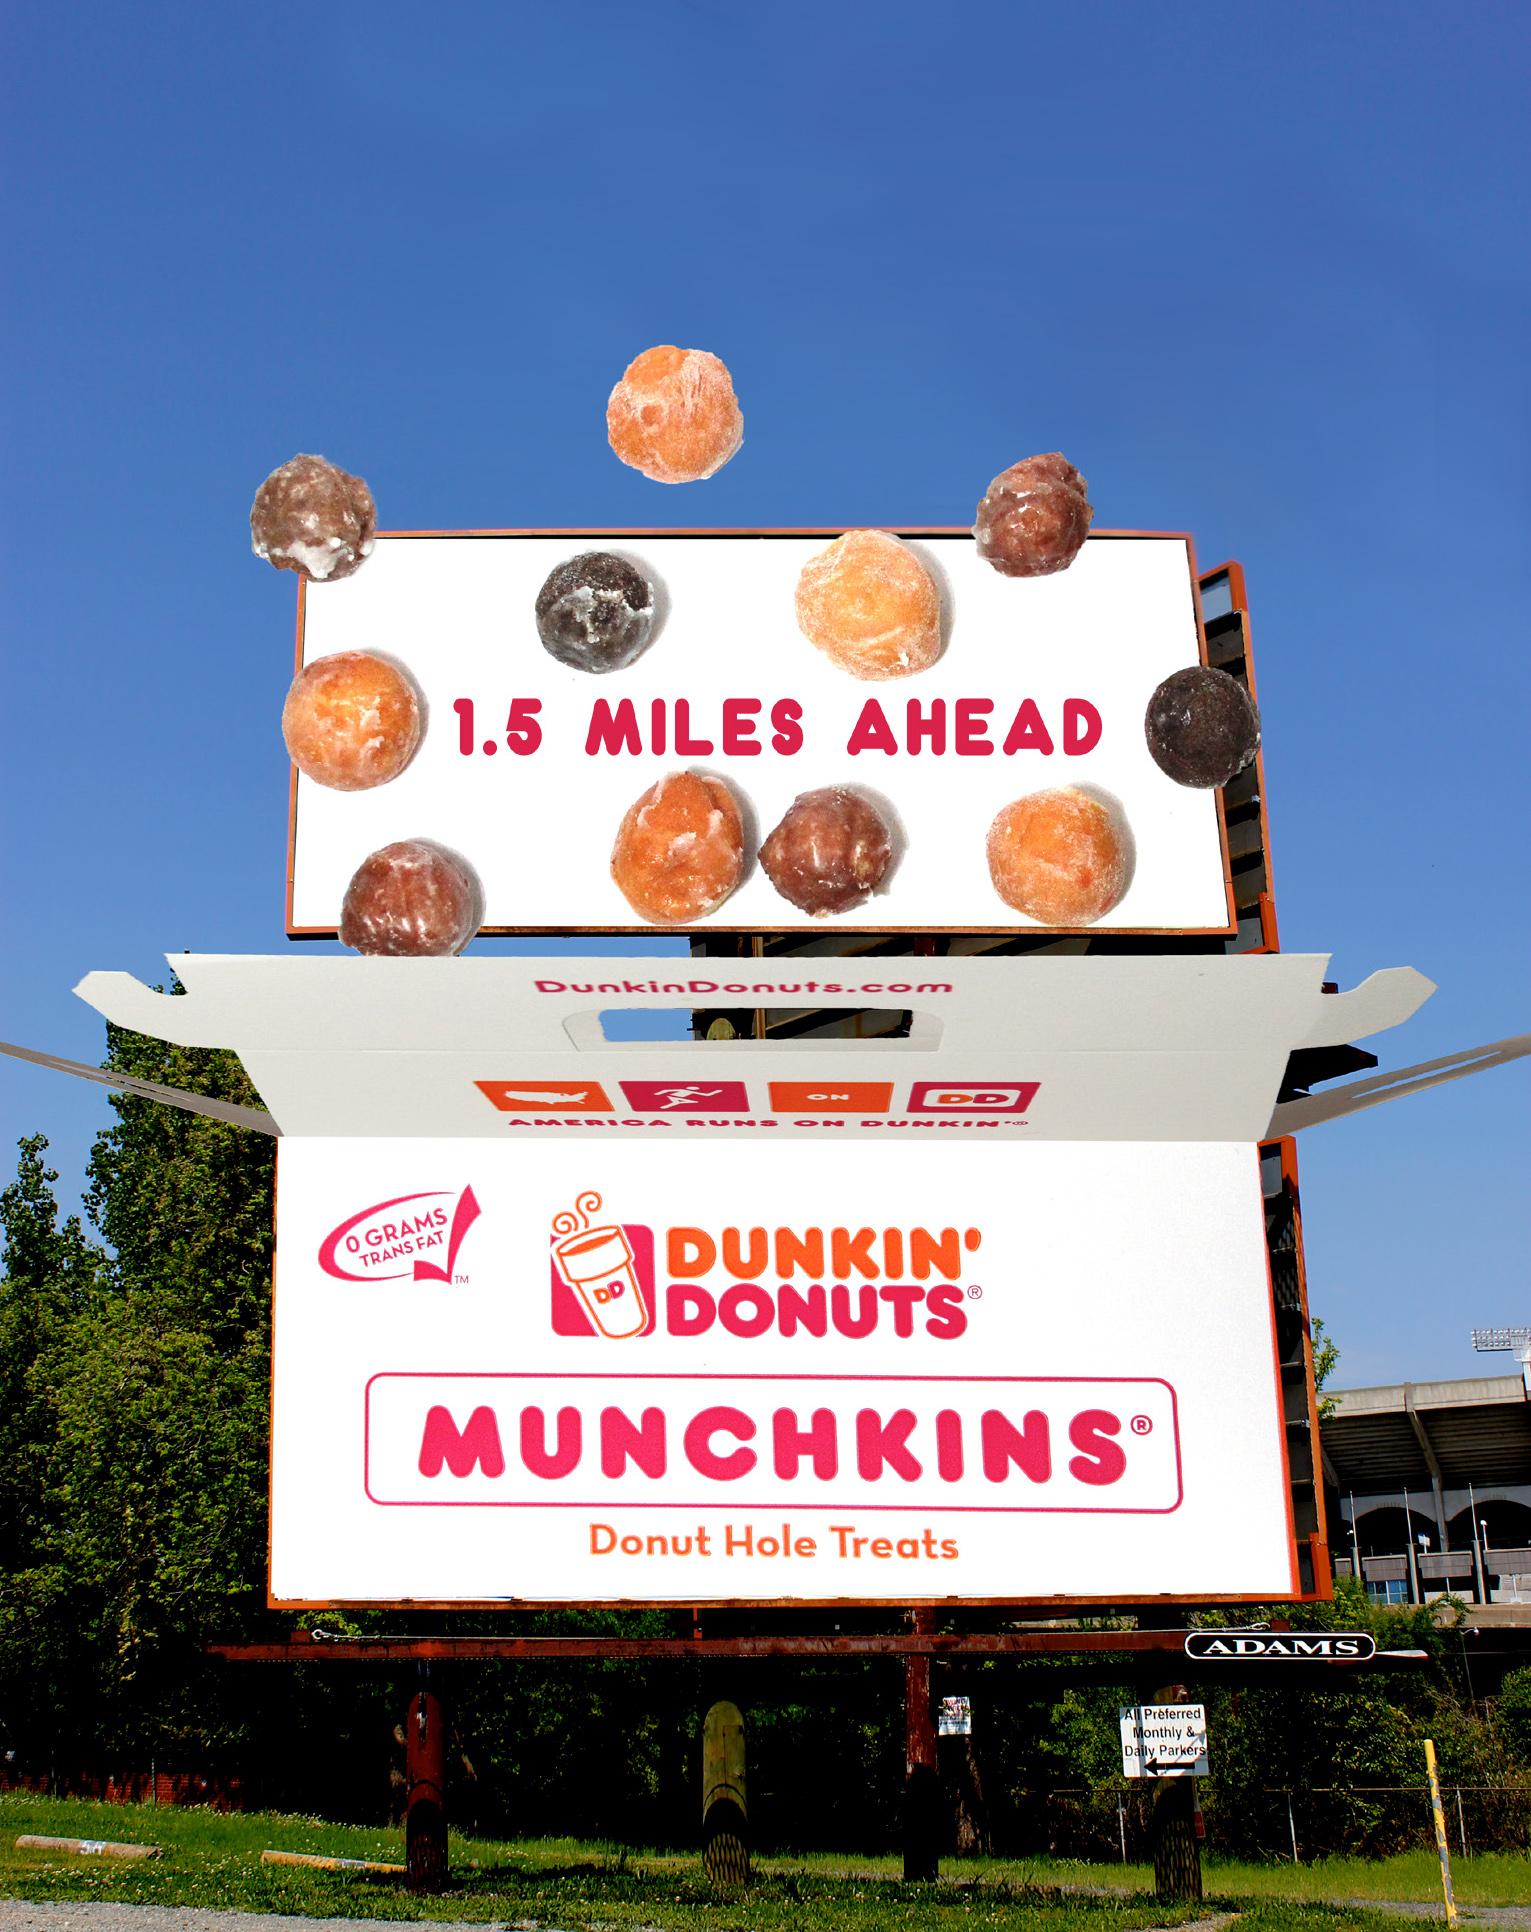 DunkinDonuts_munchkins.jpg